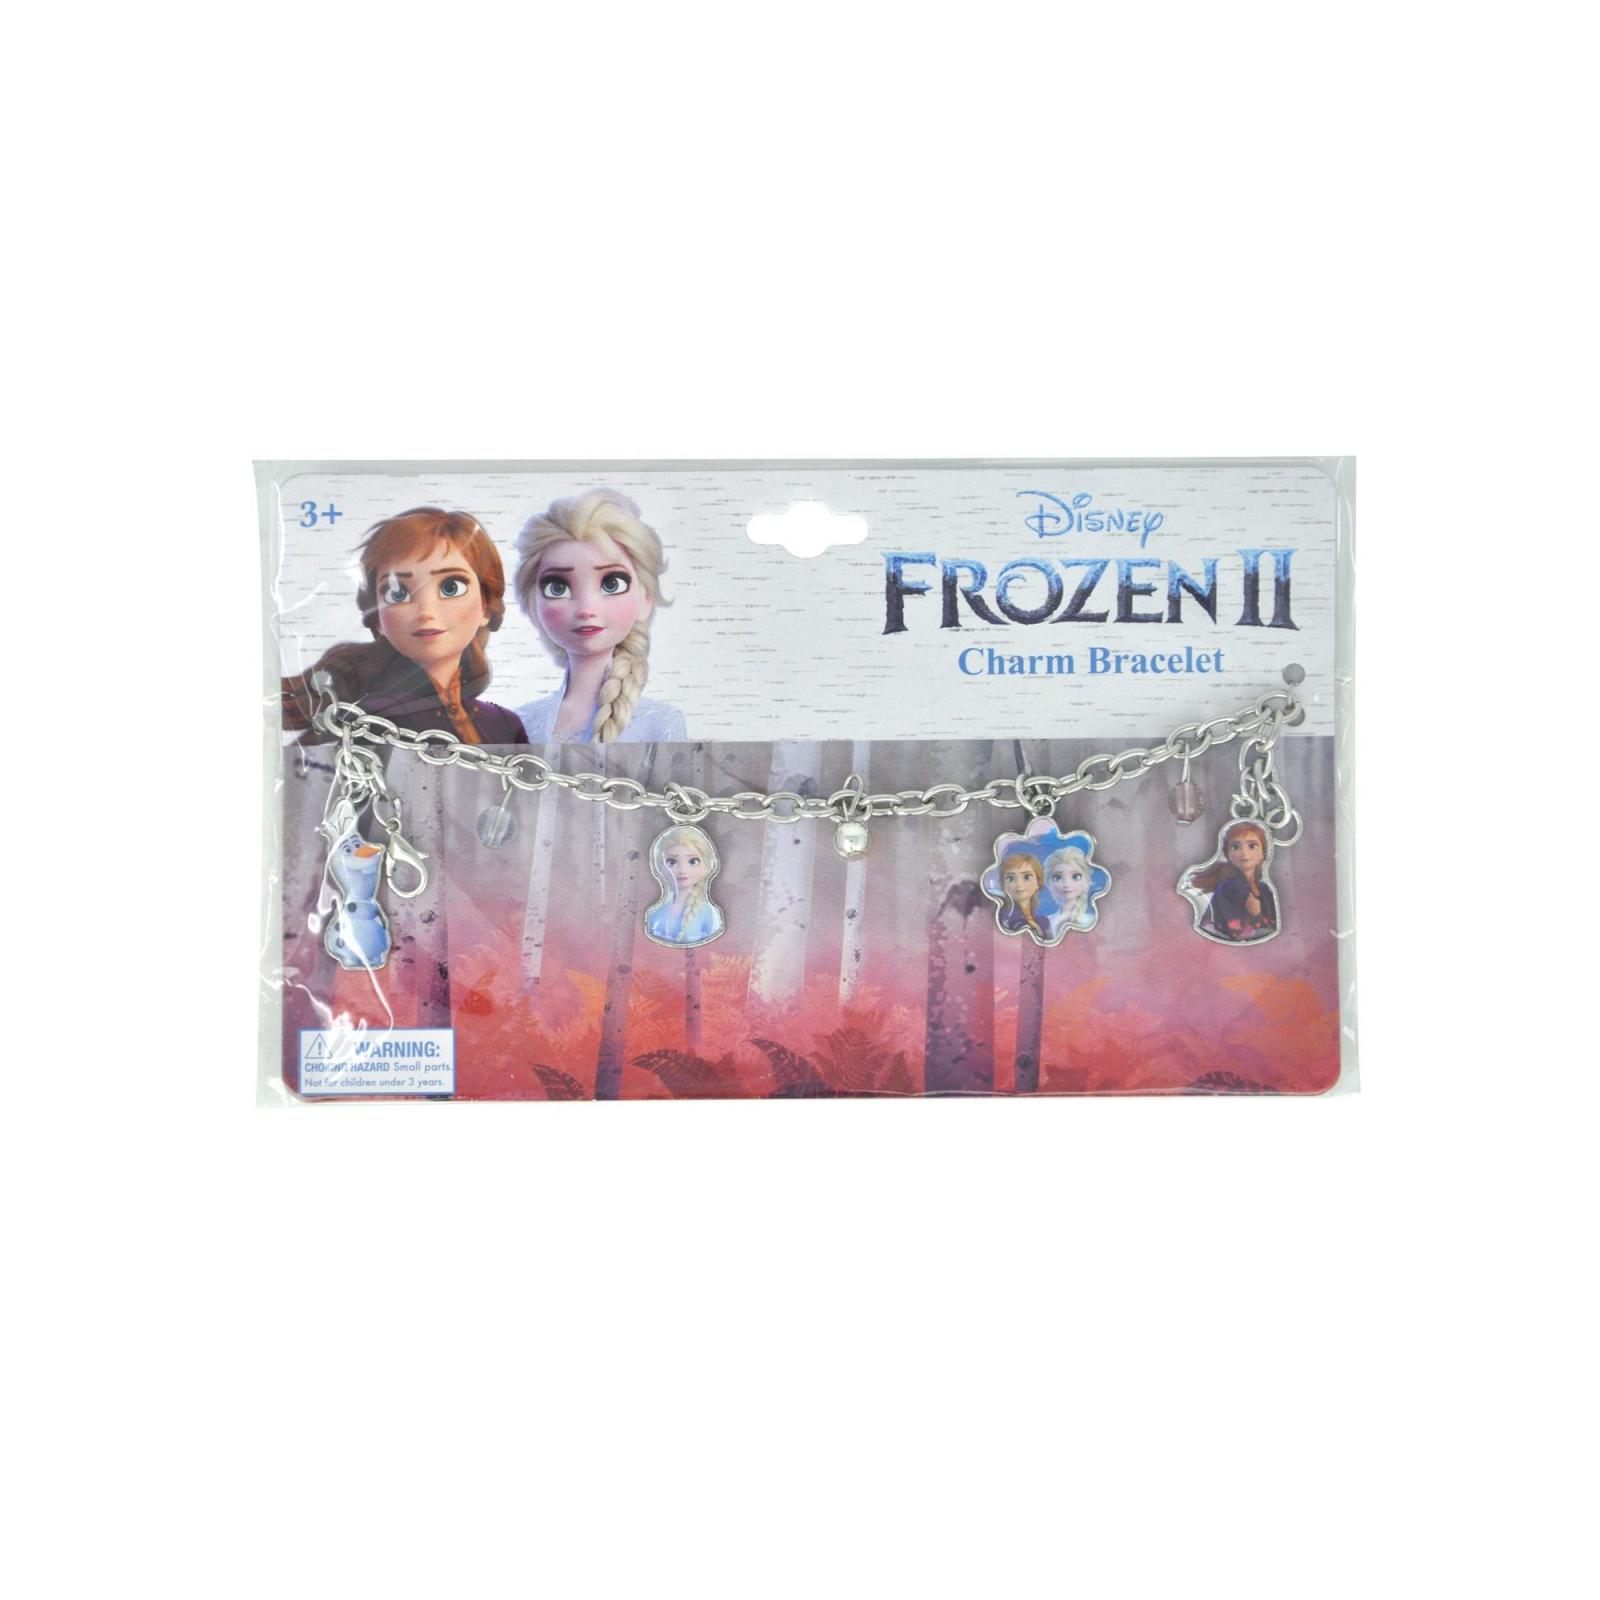 Disney Frozen 2 Charm Bracelet with Elsa Anna and Olaf